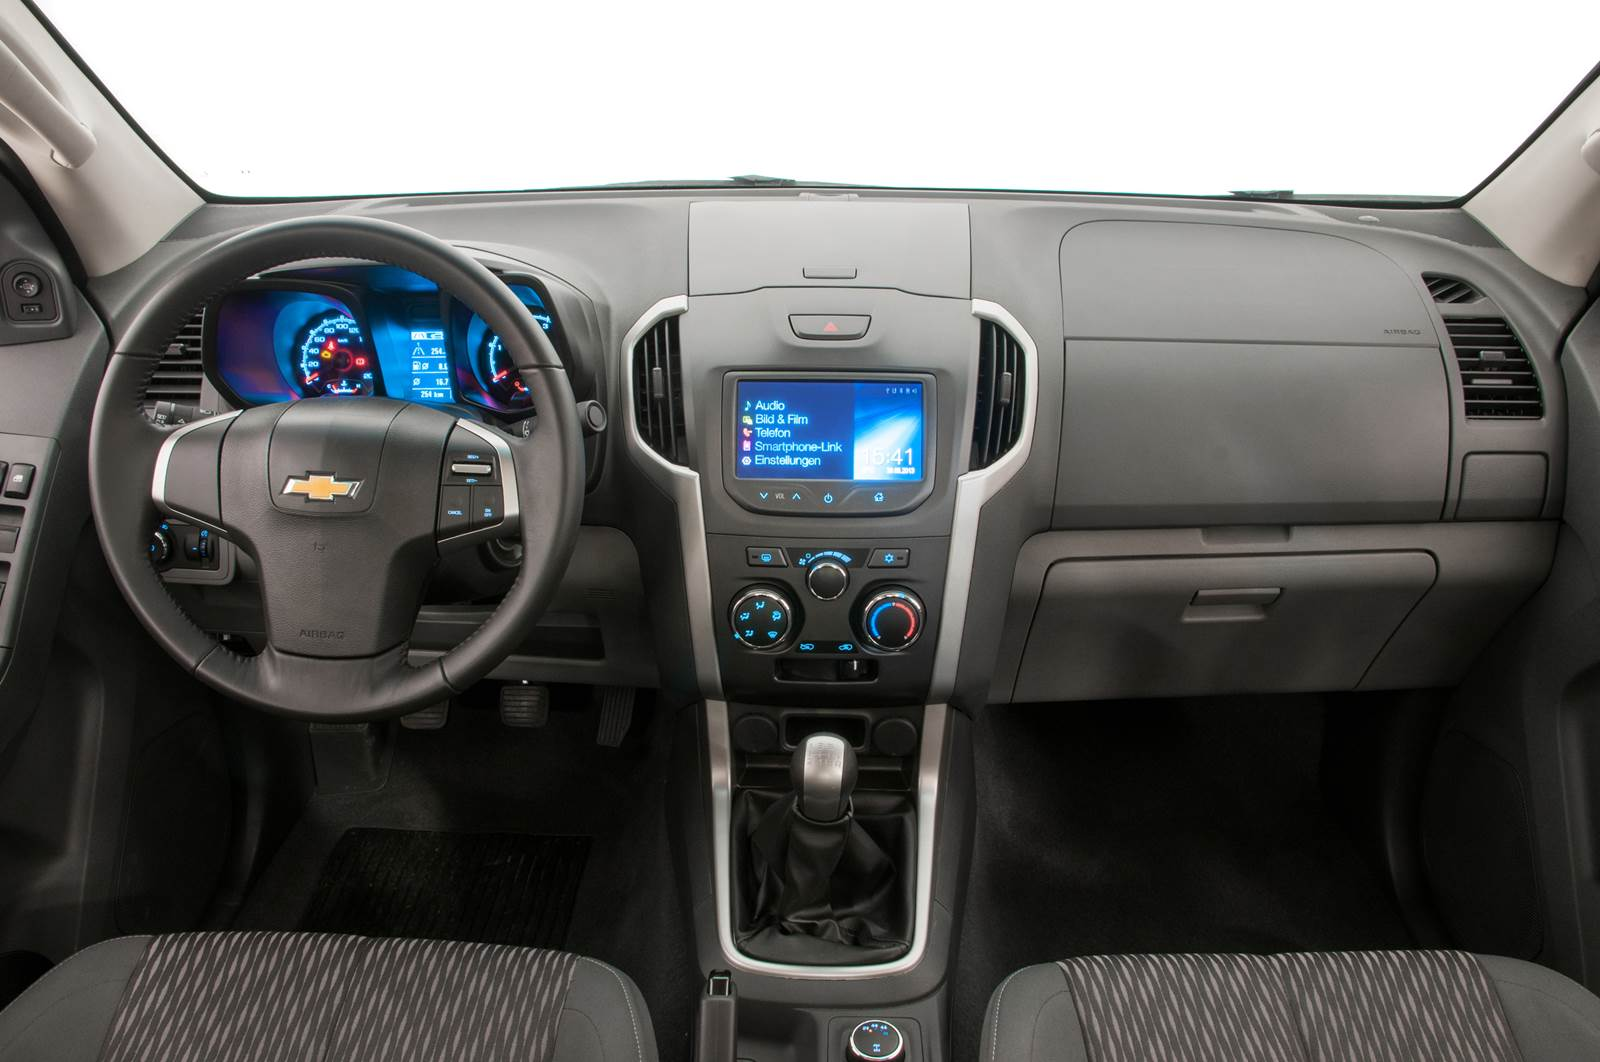 Chevrolet S-10 2.5 2015 Cabine Dupla Flex - interior